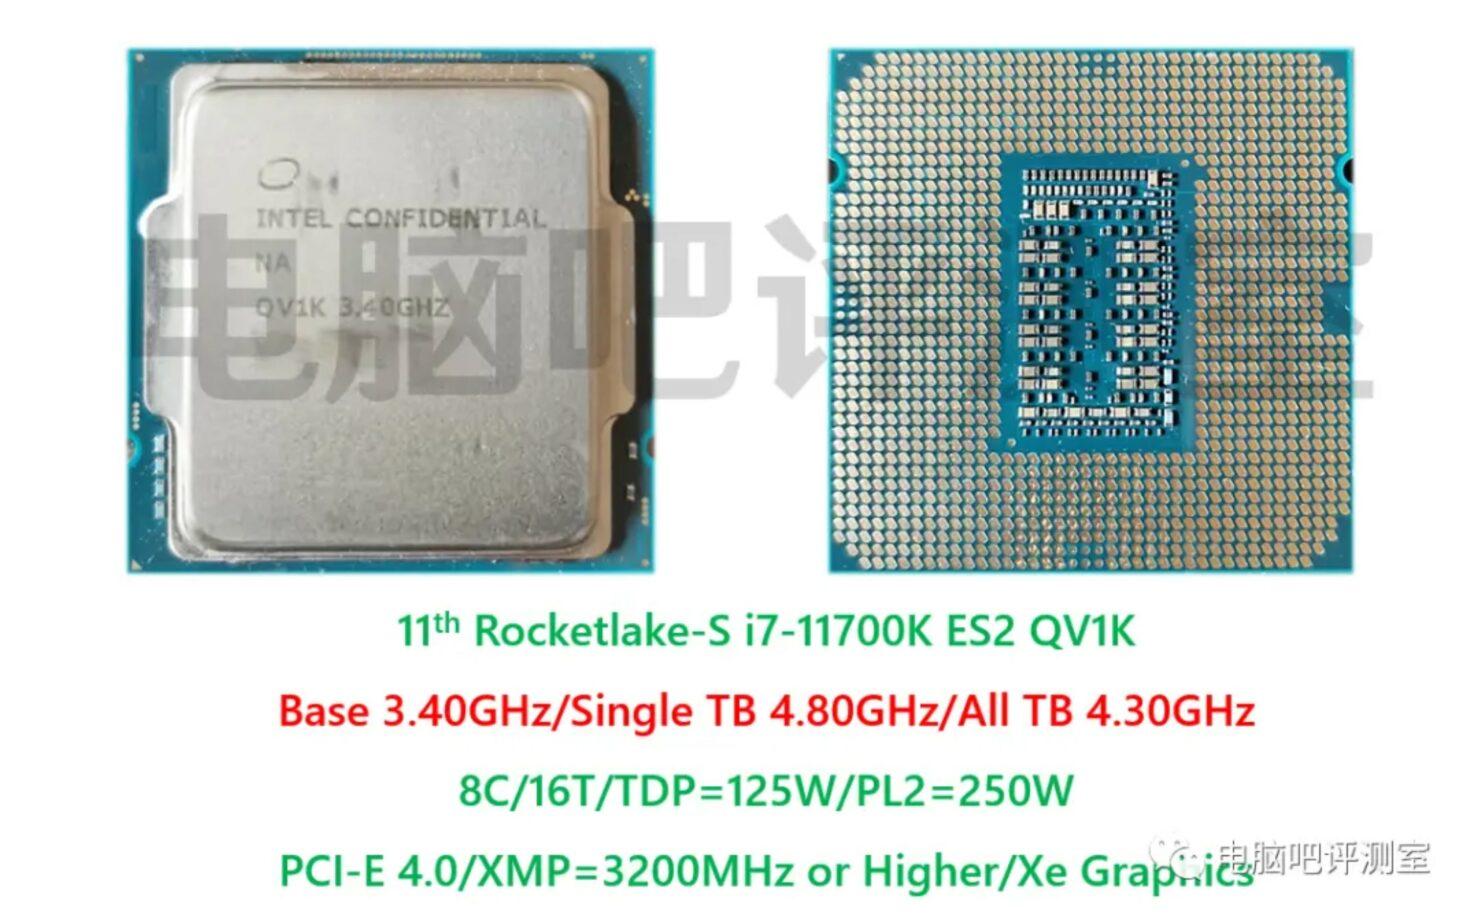 intel-core-i7-11700k-rocket-lake-8-core-desktop-cpu-_1-custom